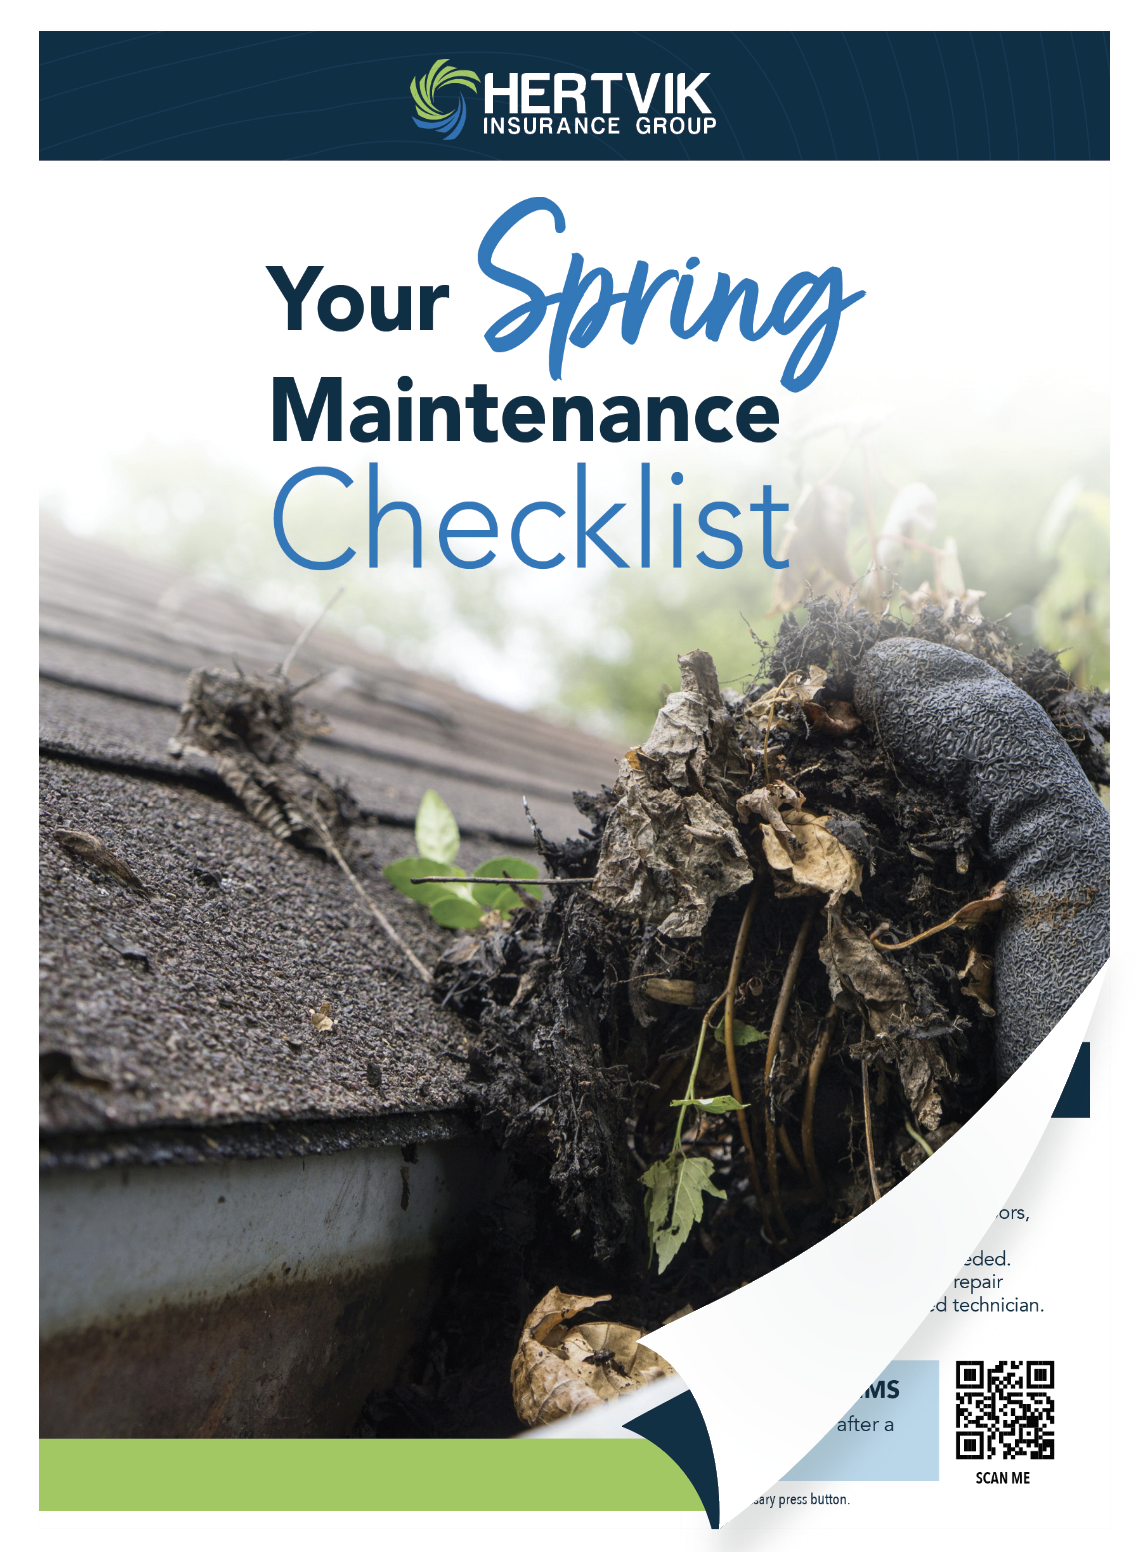 Hertvik Spring Maintenance Checklist